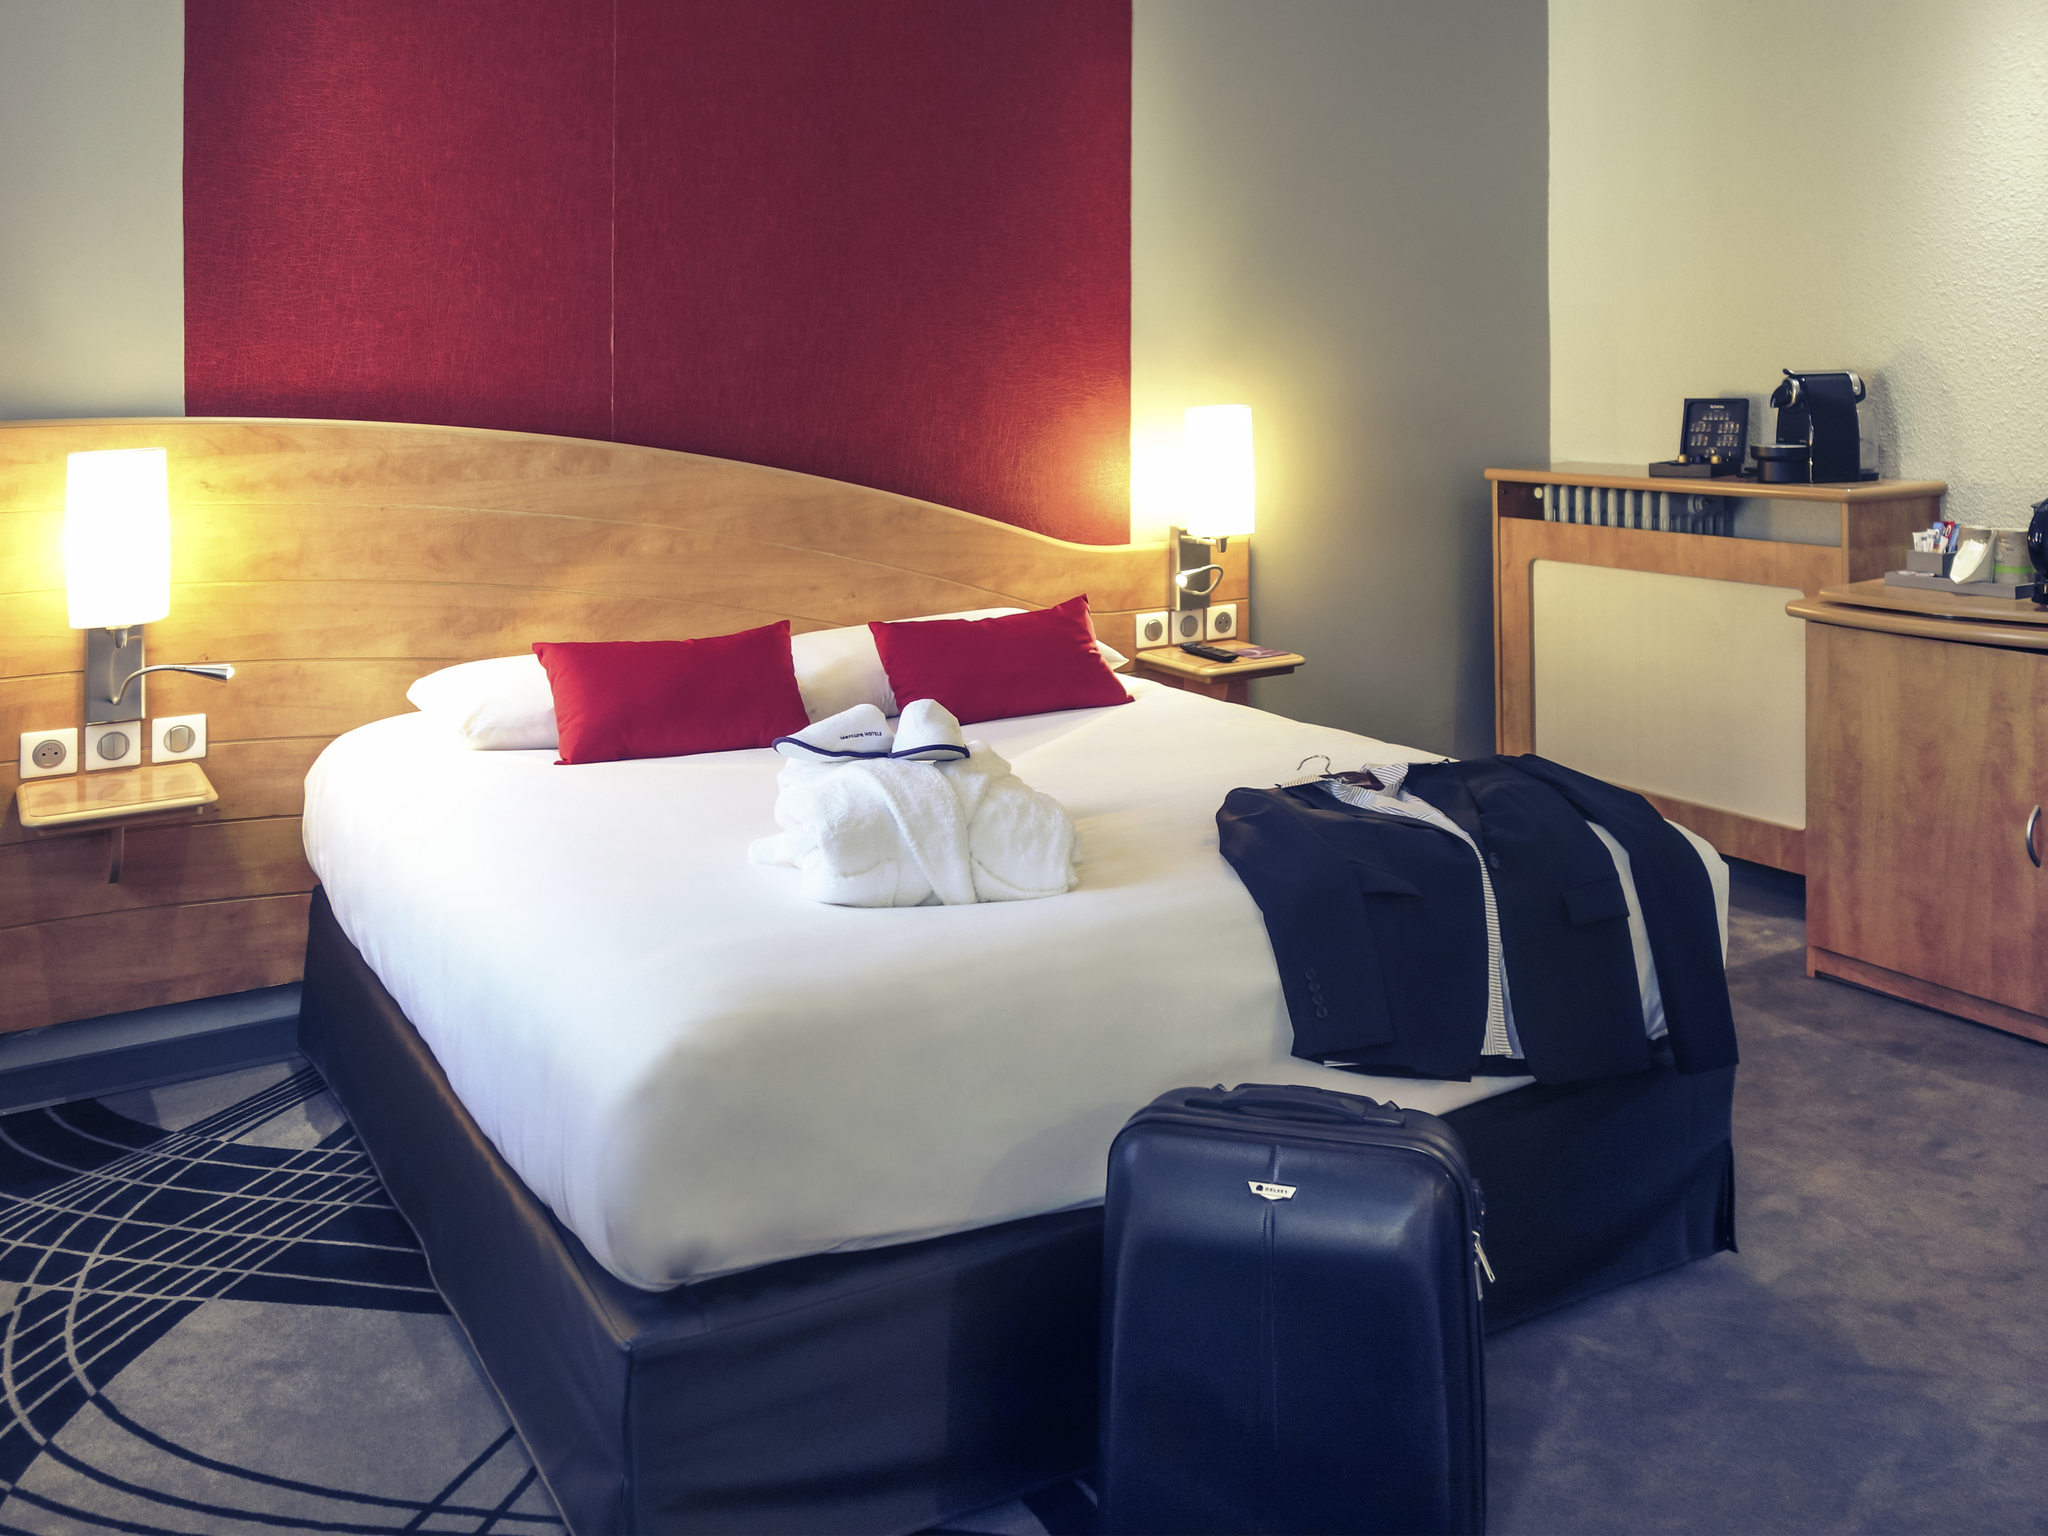 Hotel – Hotel Mercure Epinal Centre